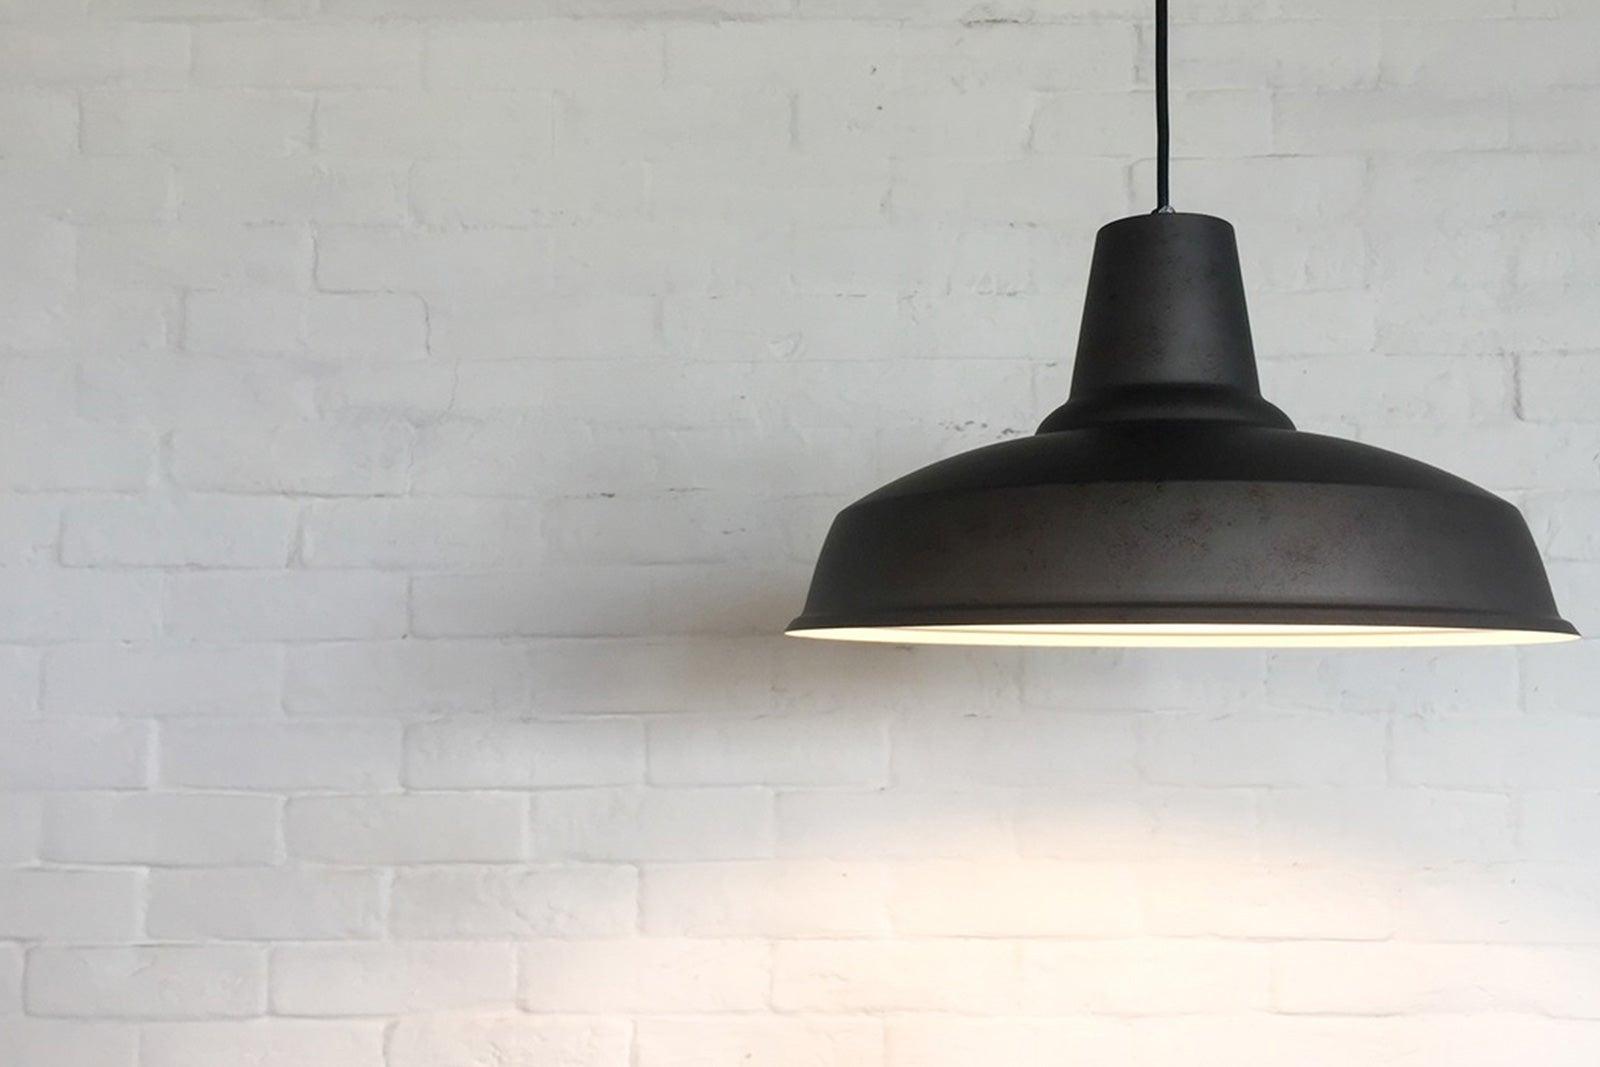 install_light_fixture.jpg